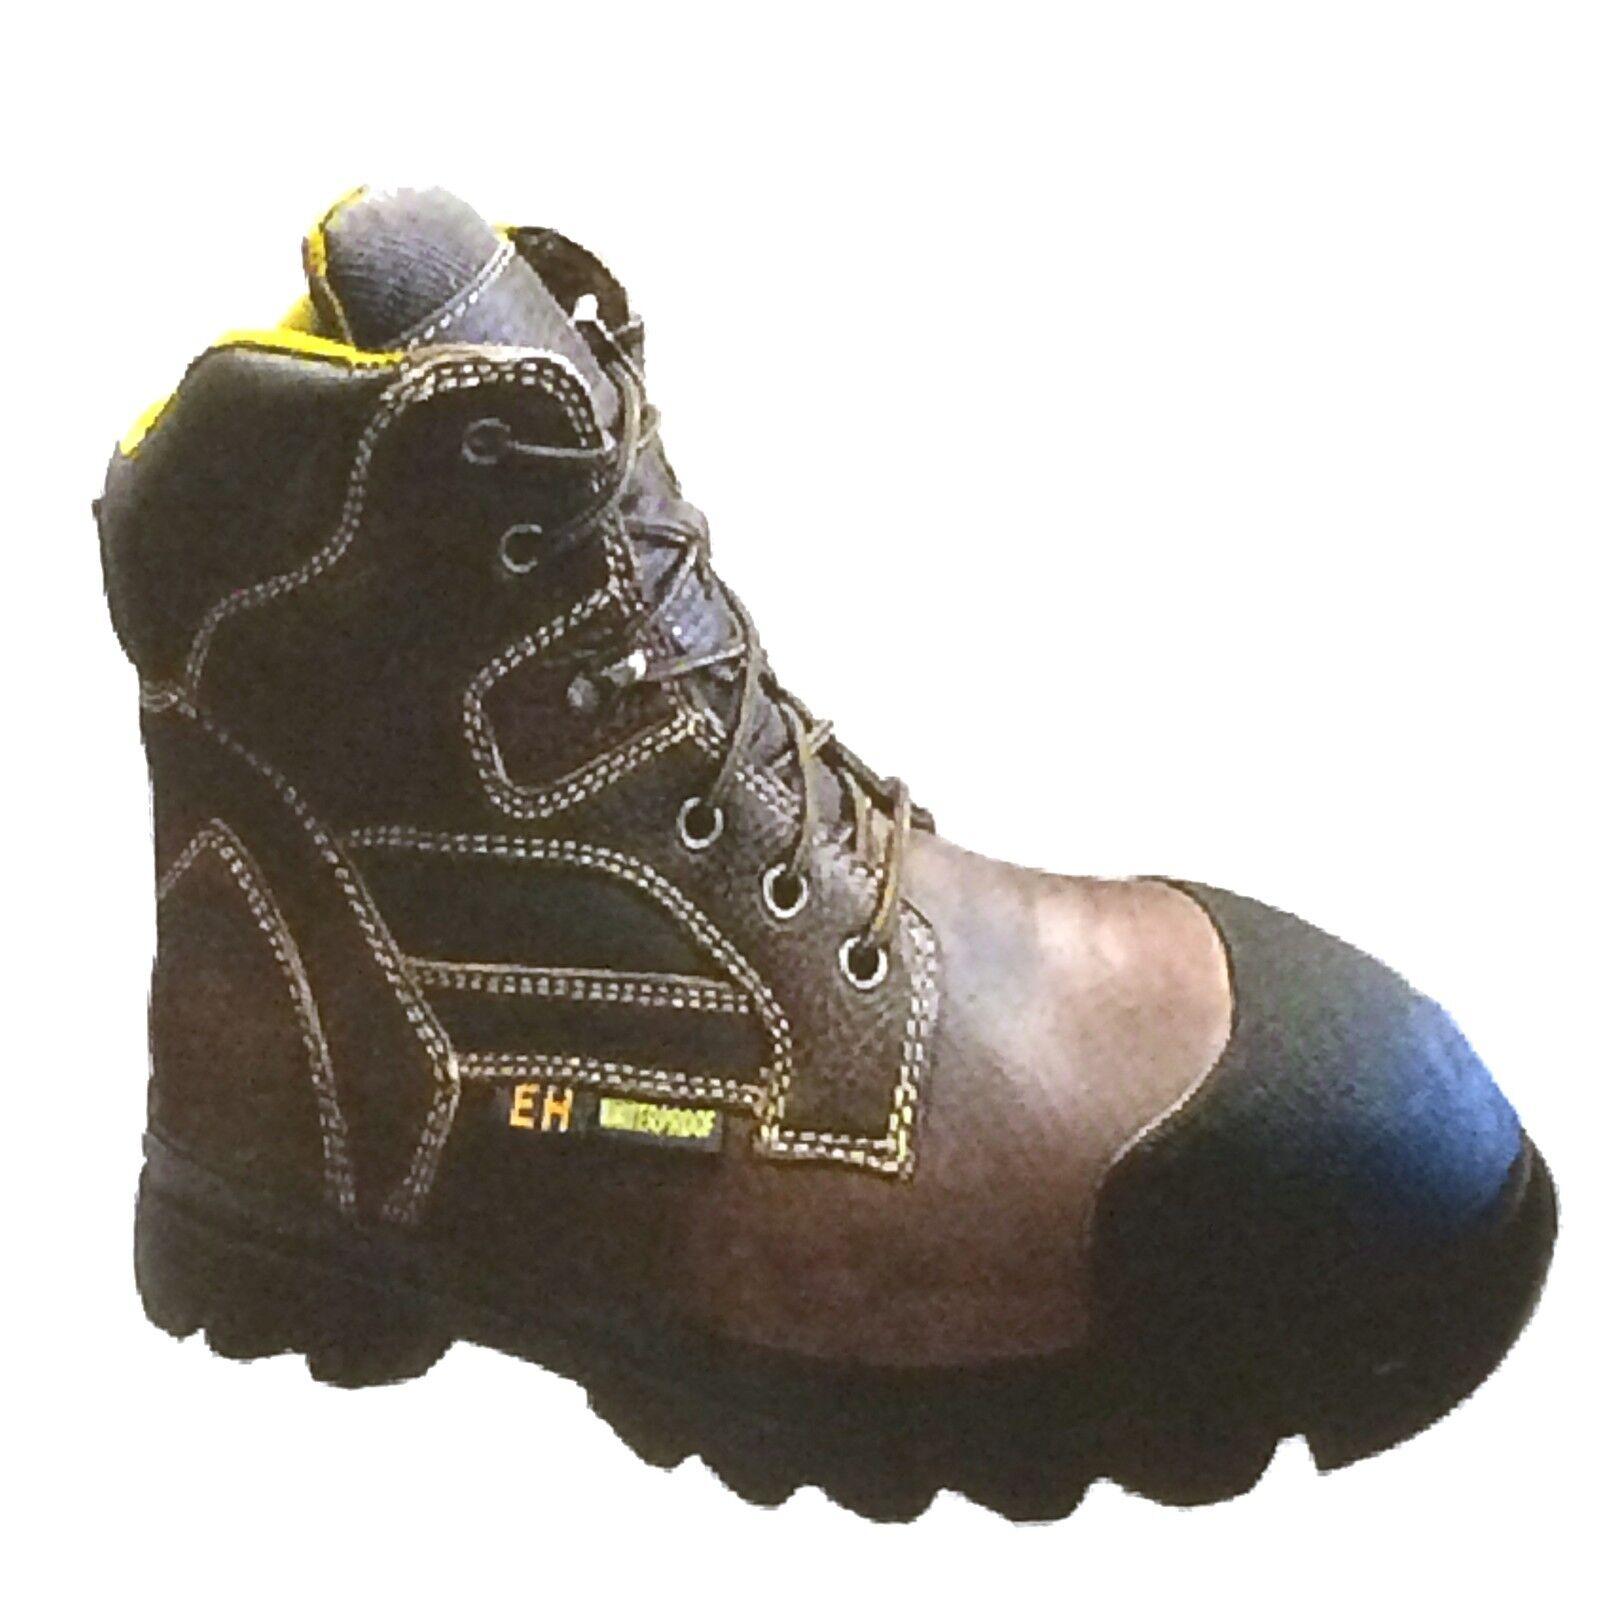 9767 Tecs, marron, 6  Huilé Cuir Hommes (Steel Toe) Work démarrage